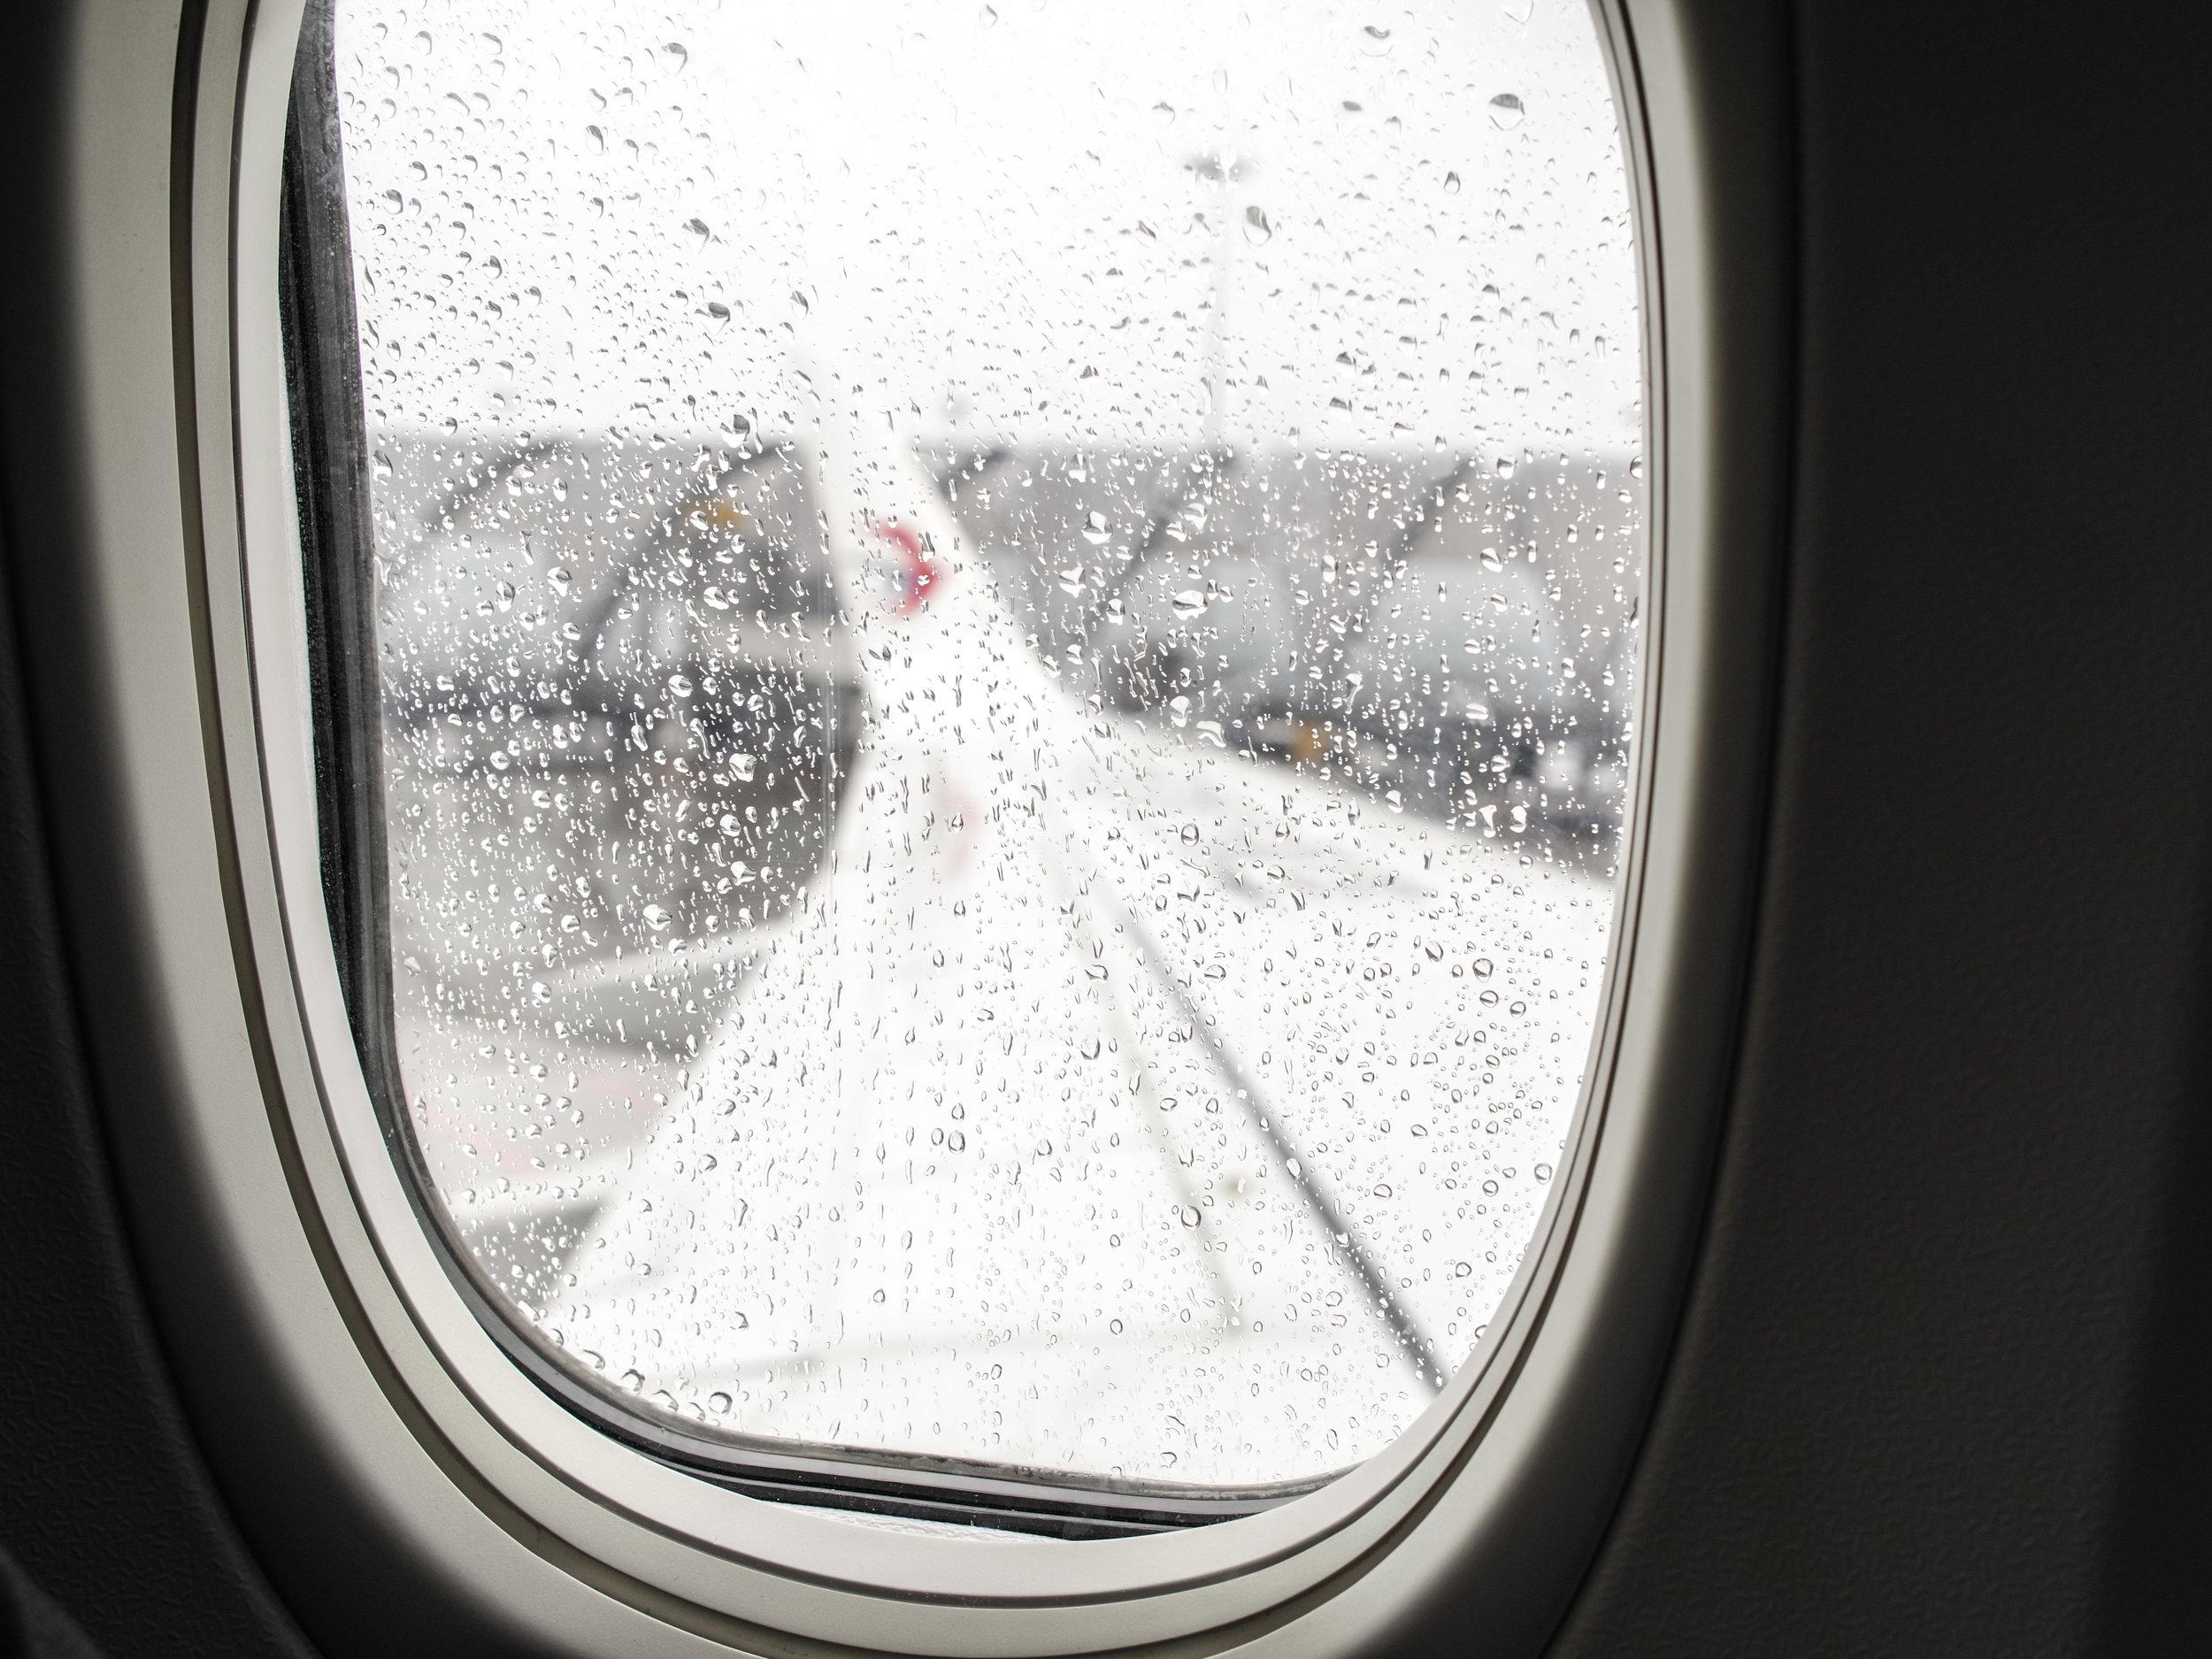 China Eastern - Chengdu to Diqing